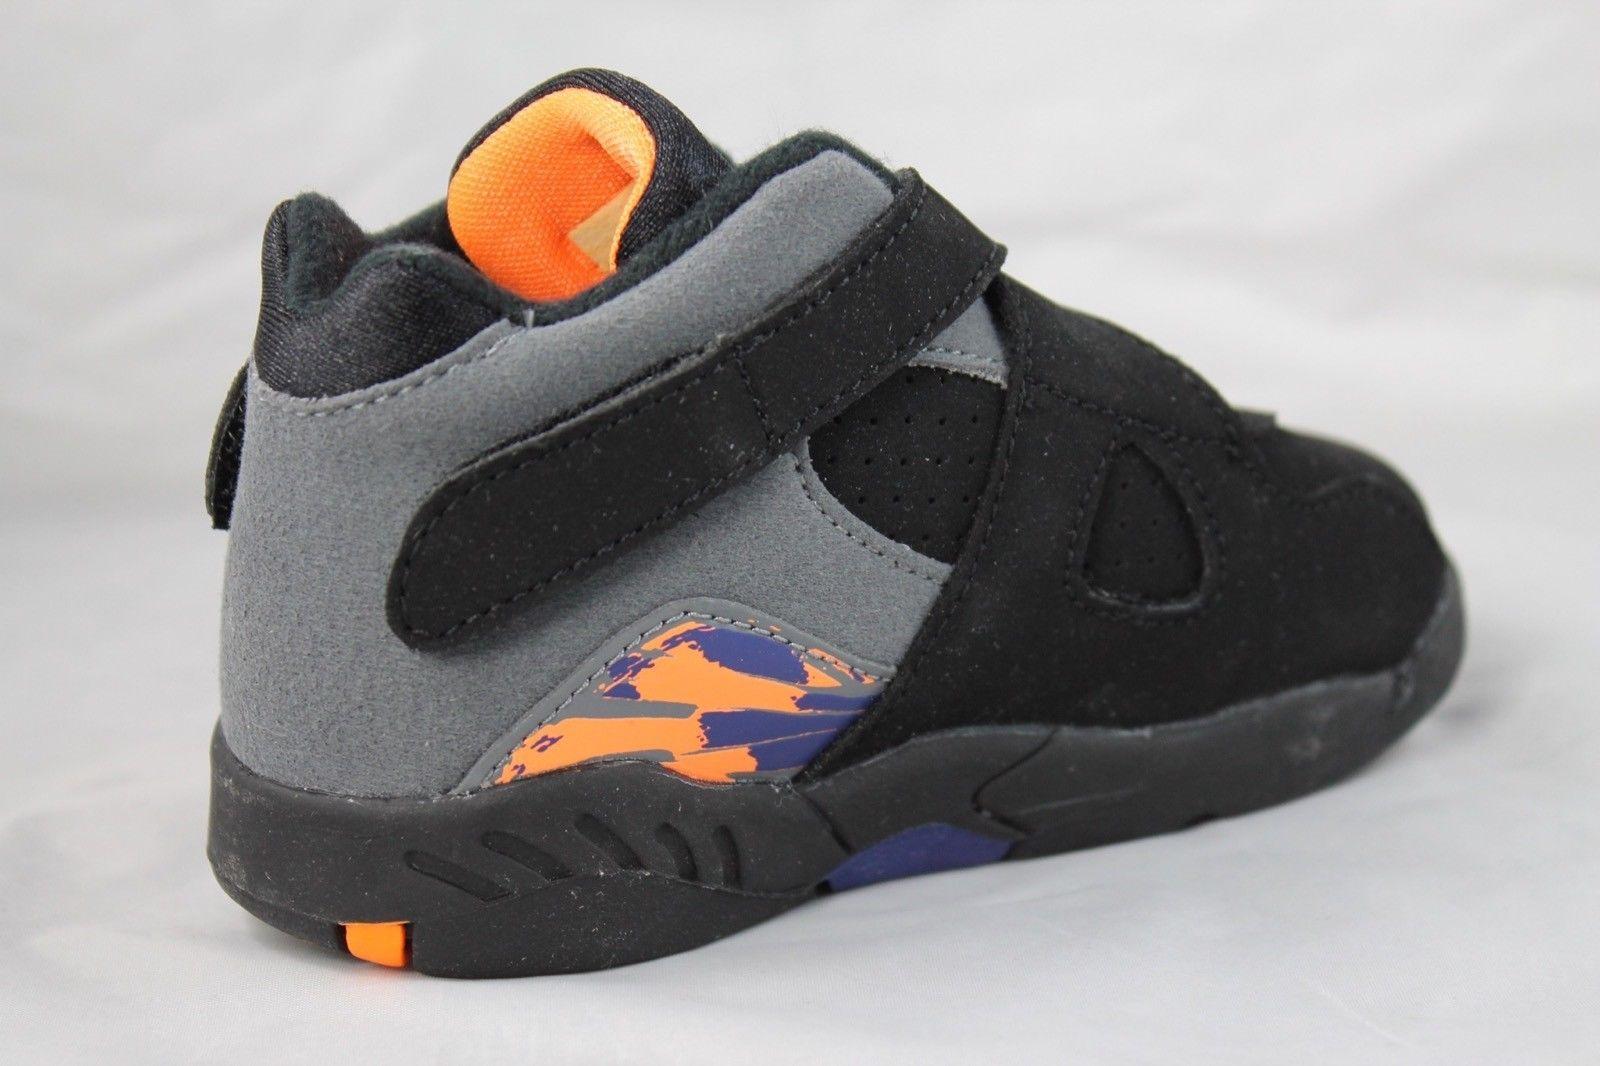 best cheap 8b1f7 60939 NIKE Air Jordan 8 Retro (TD) Black Bright Citrus Cool Grey Shoes 305360